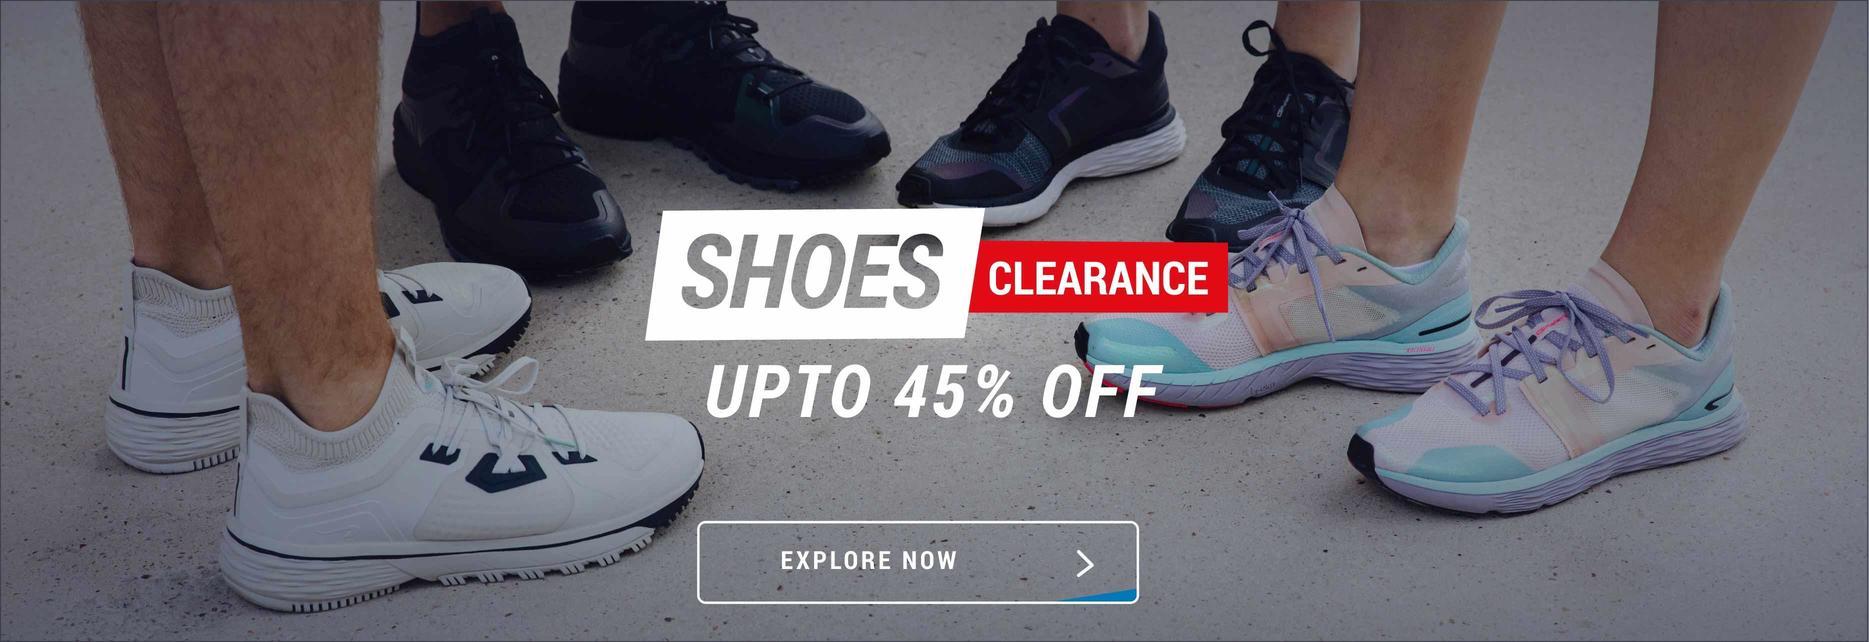 Decathlon Clearance shoes